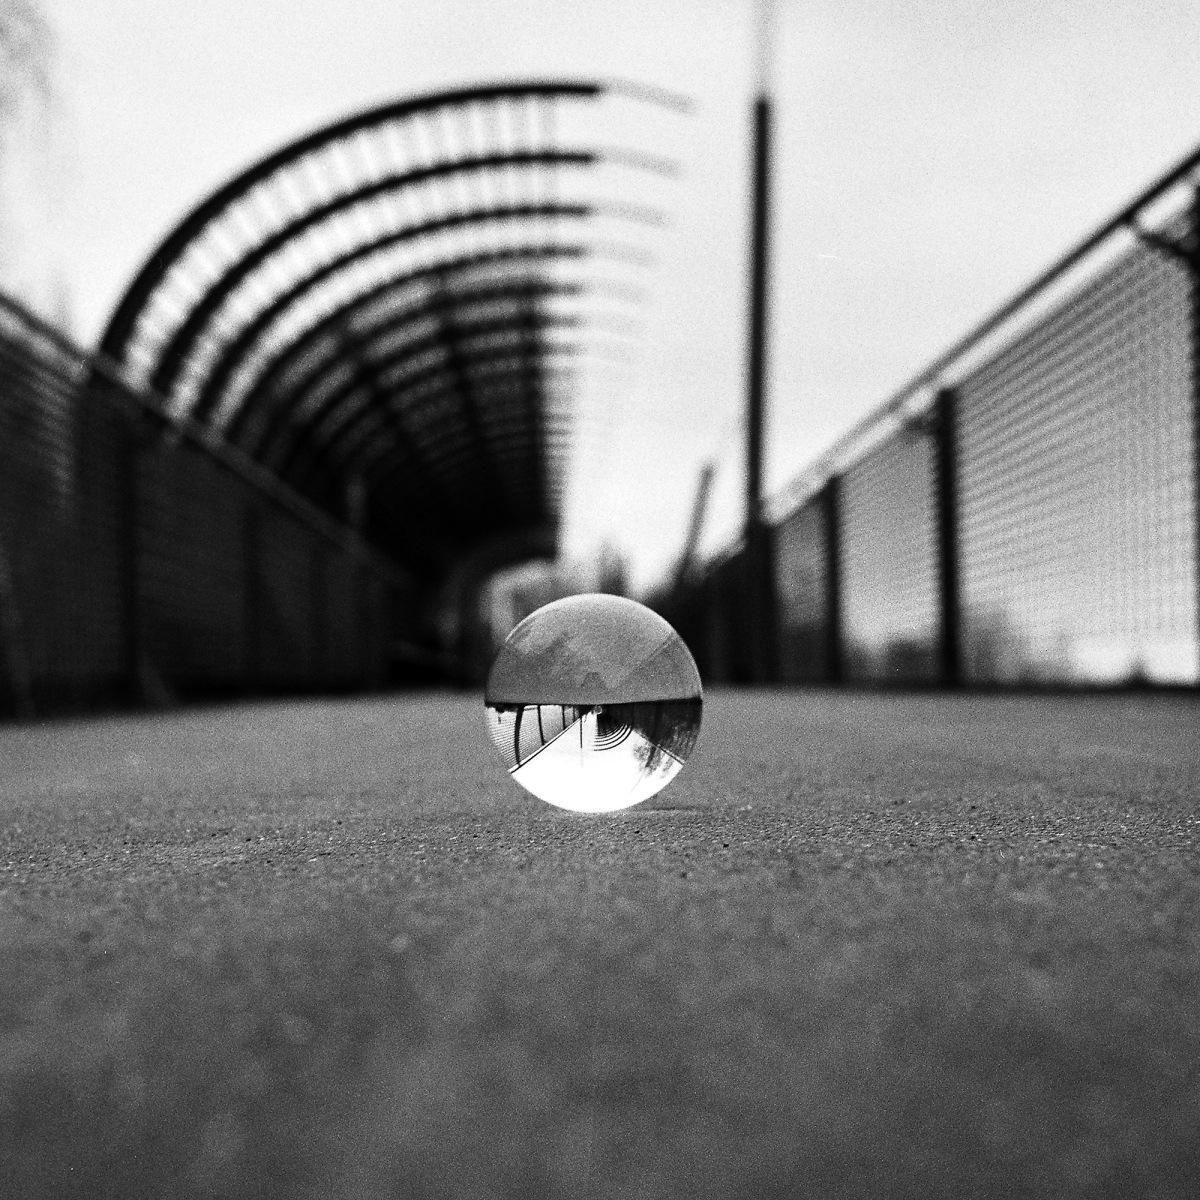 Glaskugel auf der Fußgängerbrücke im Westpark in Bochum